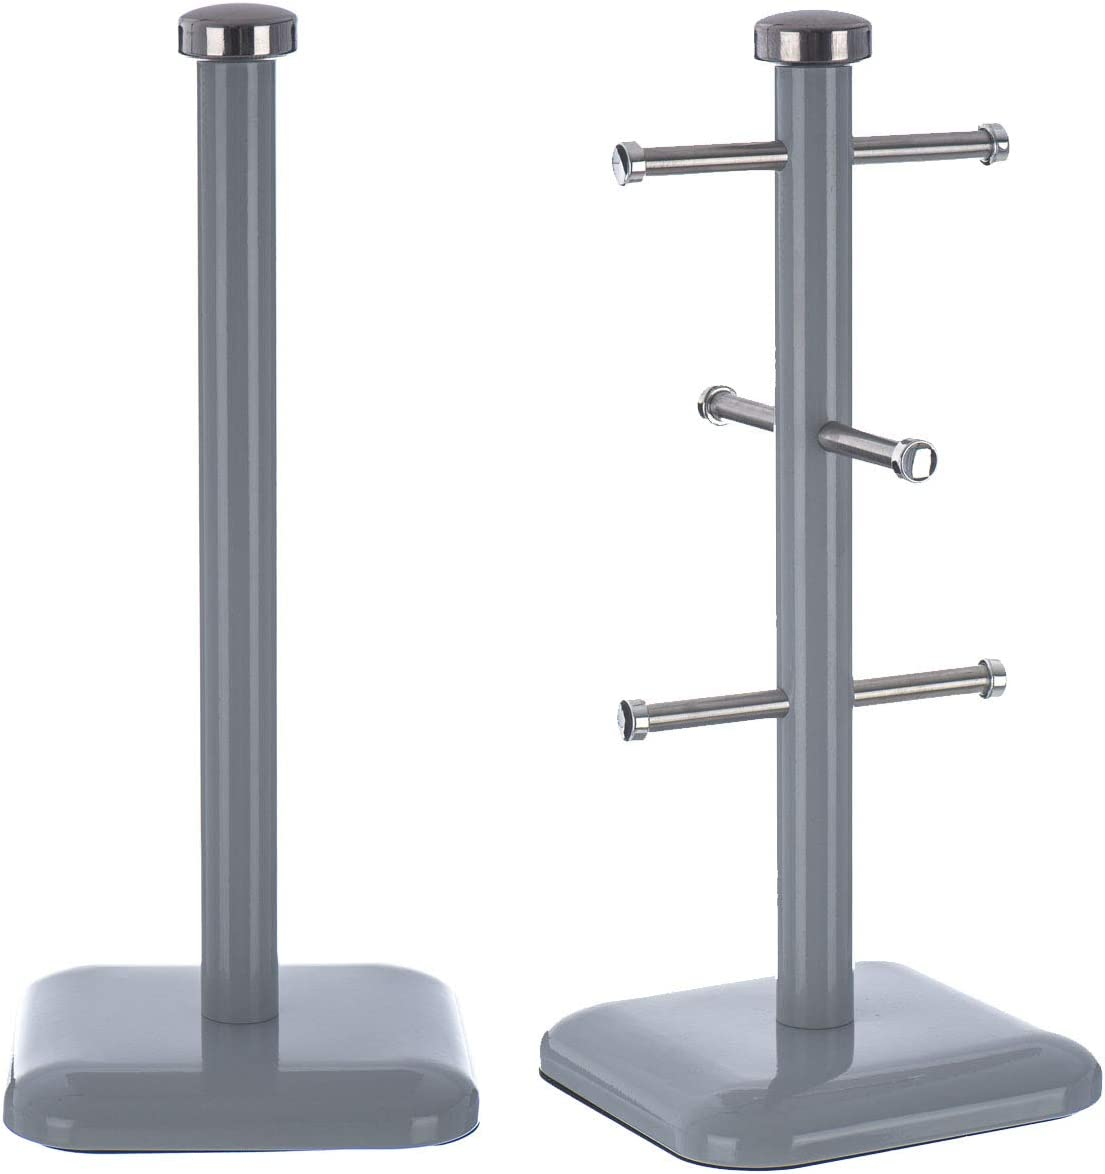 LIVIVO Taurus Stainless Steel 6 Cup Mug Tree Stand /& Kitchen Towel Paper Roll Pole Holder Coffee Tea Mugs Cups Drying Storage Rack Grey